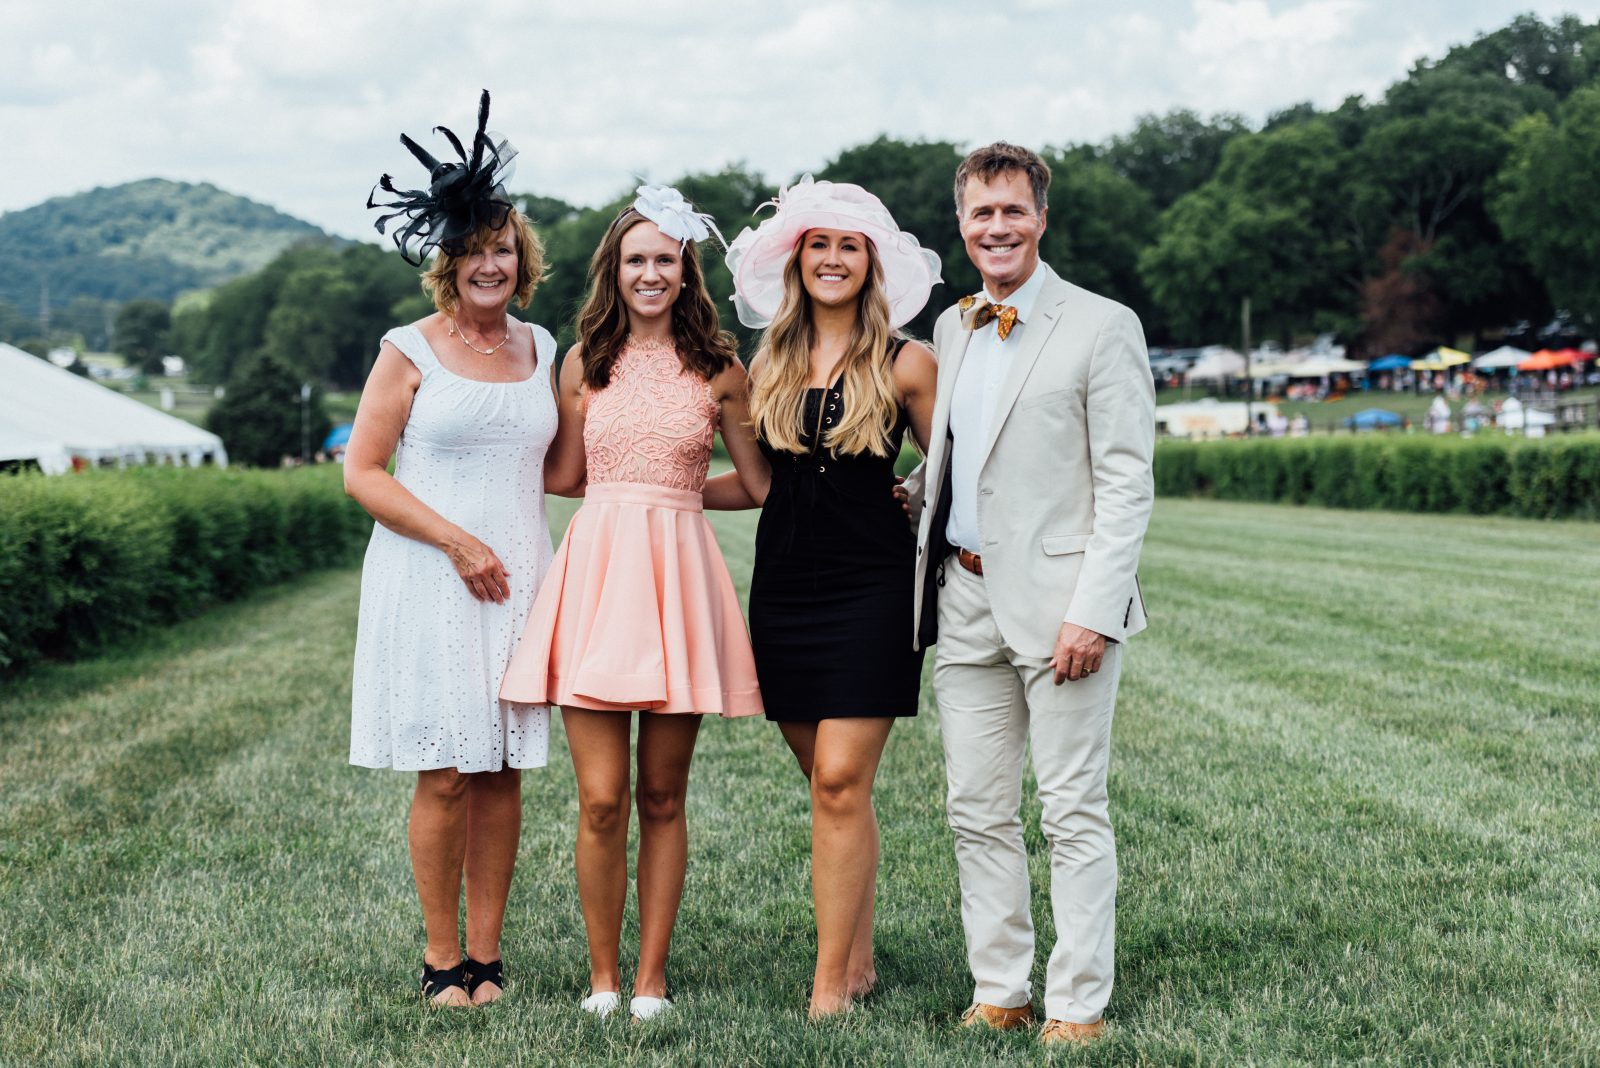 Steeplechase Fashion show featuring Kelly, Nicole, Jaclyn and Tom Kowalski. Nashville Fashion show